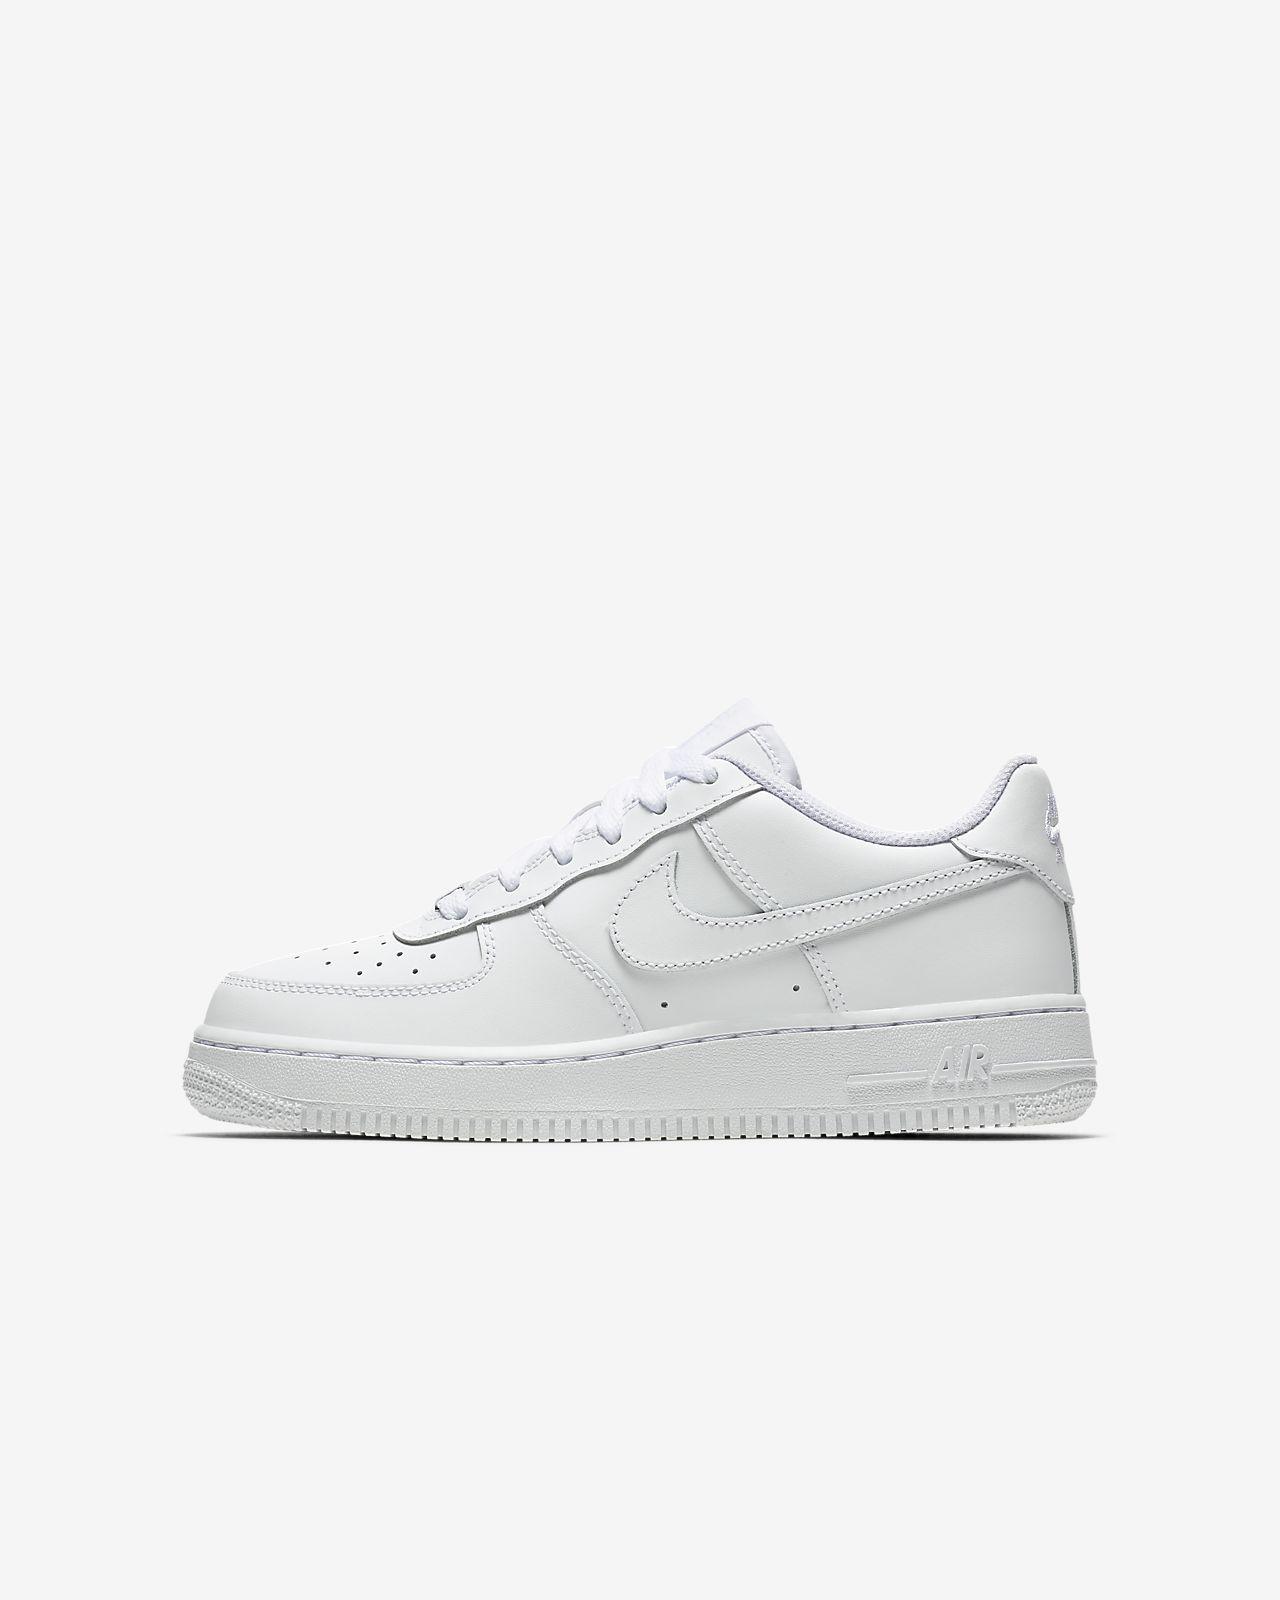 Nike shoes air force, Nike air force